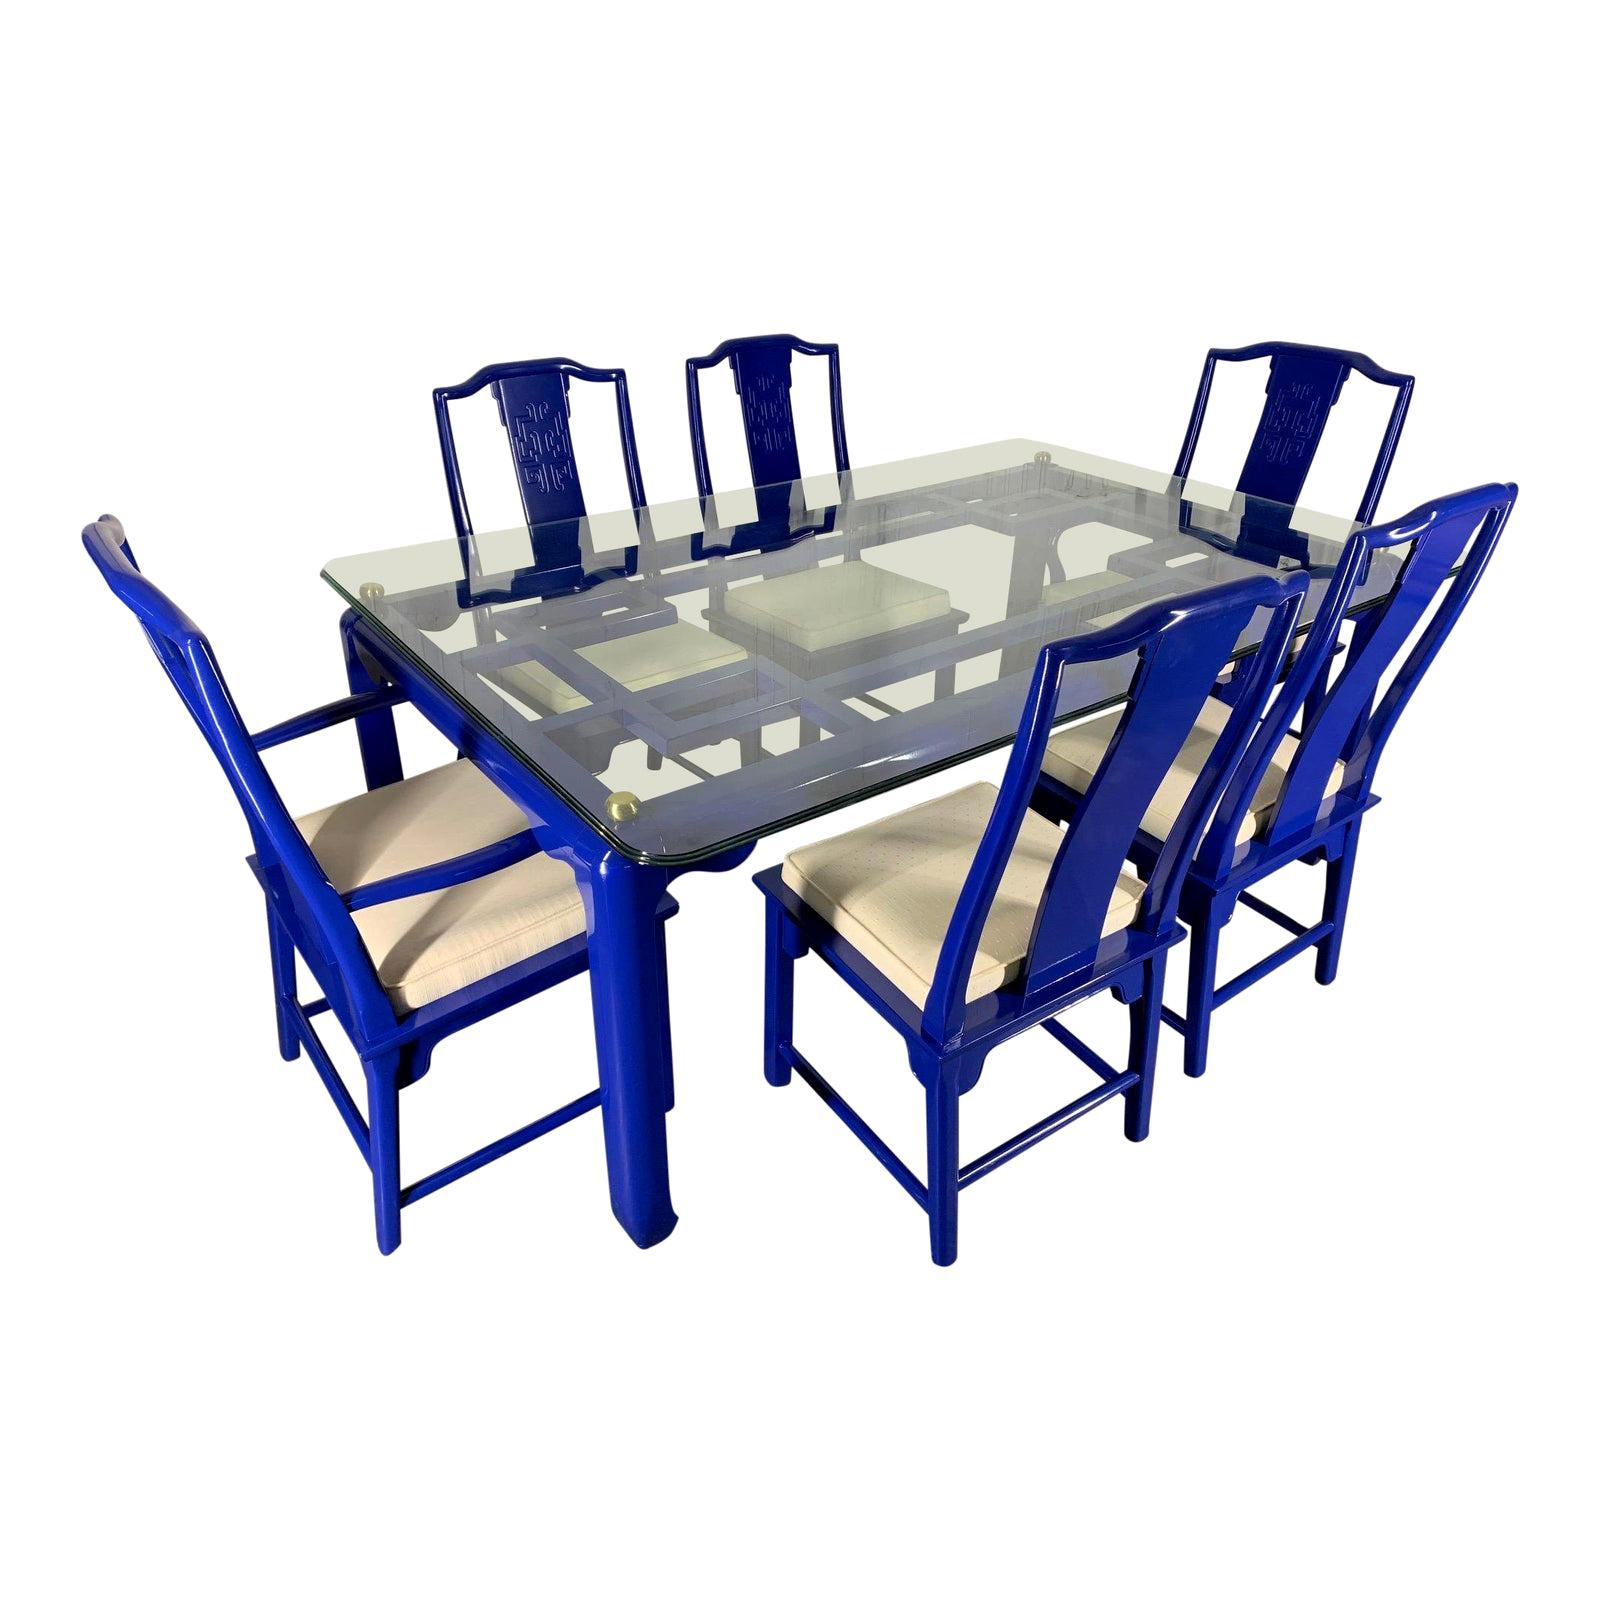 Chin Hua Asian Dining Set by Raymond Sabota for Century Furniture